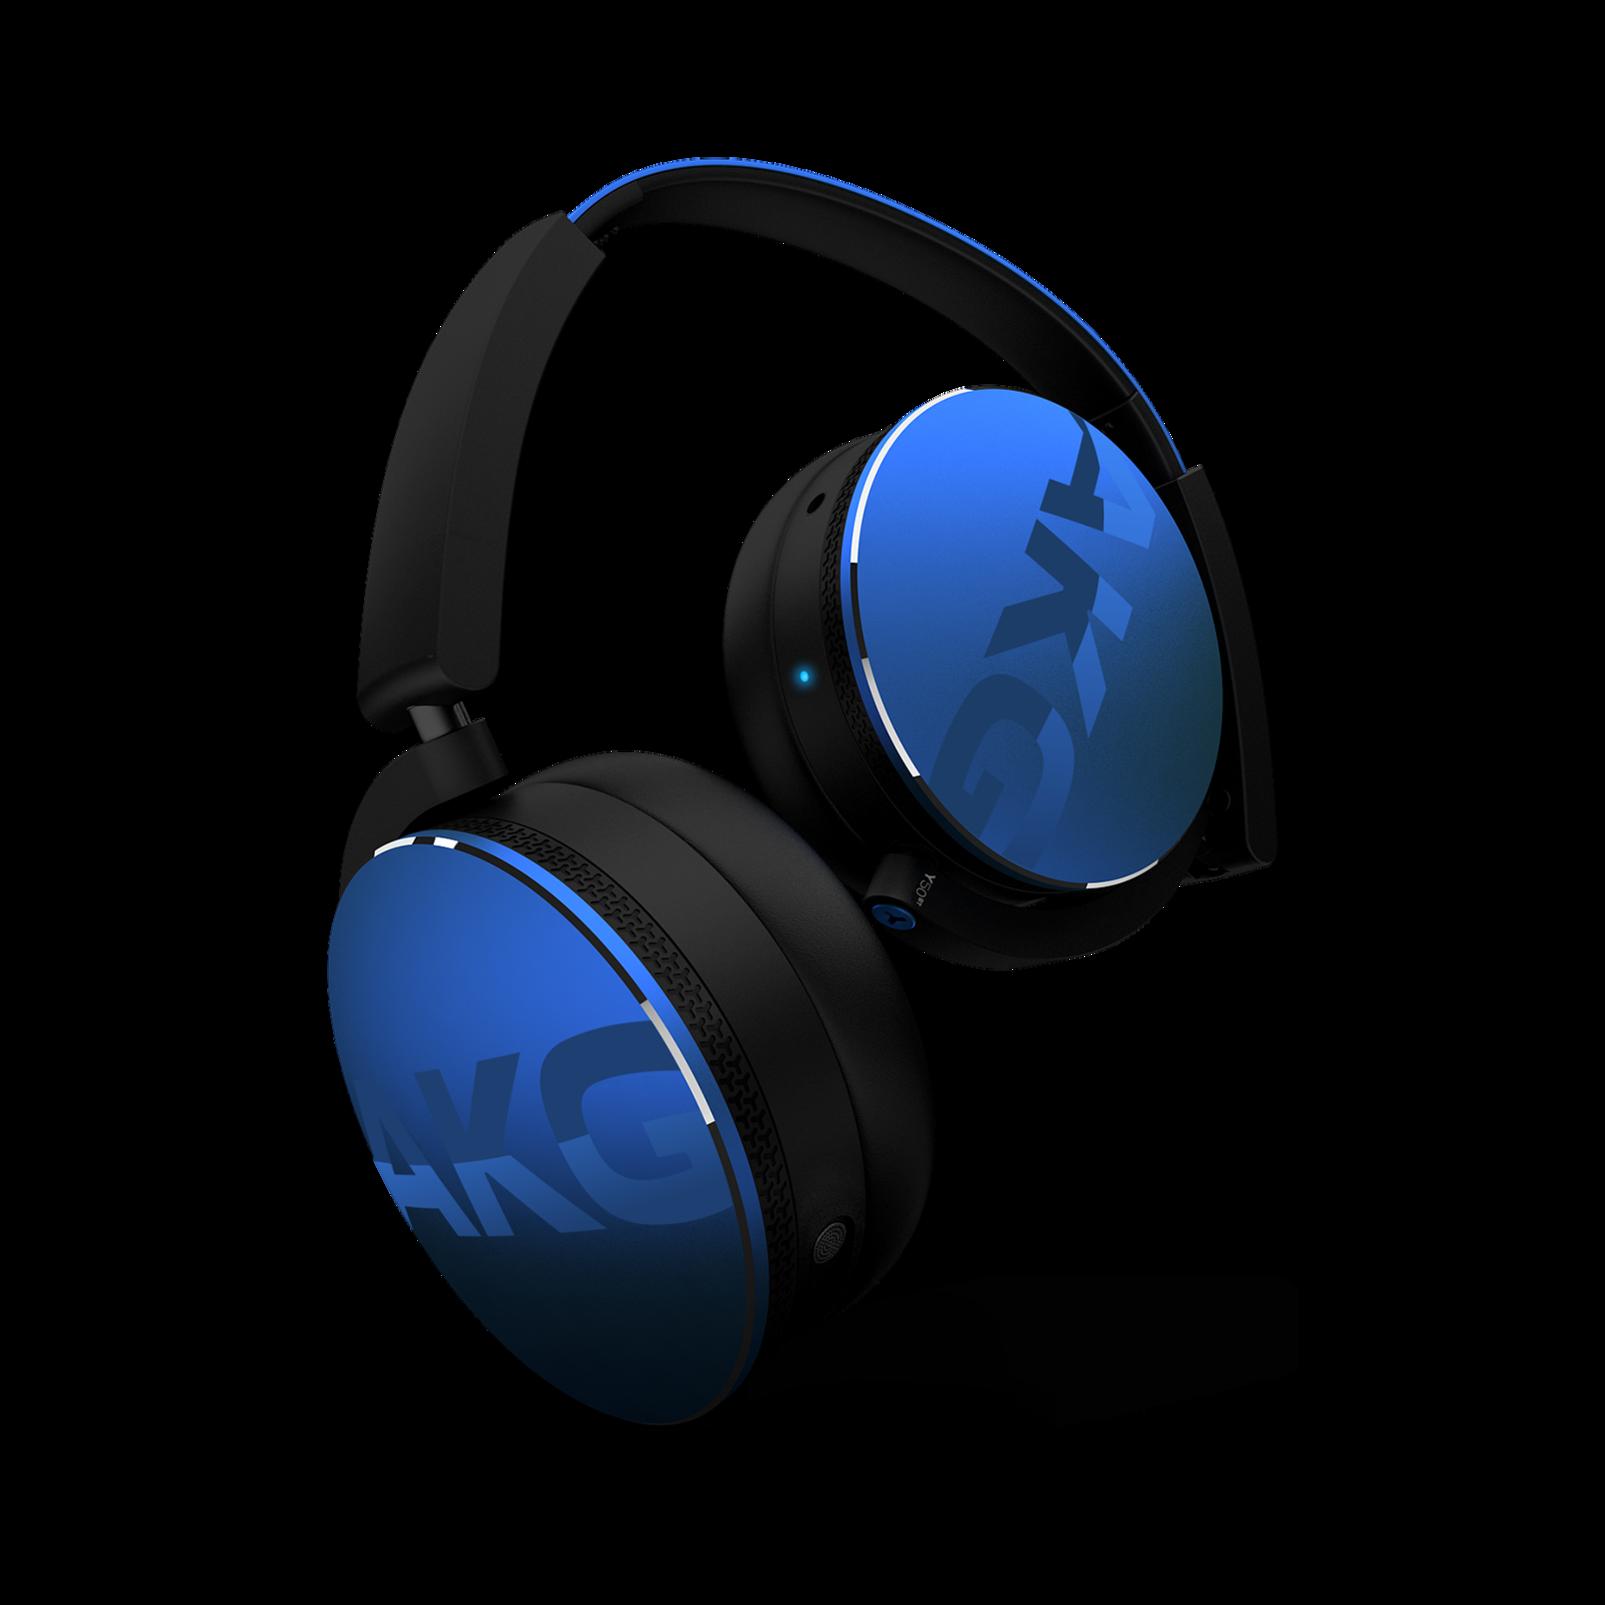 Y50BT - Blue - Premium portable Bluetooth speaker with quad microphone conferencing system - Detailshot 3